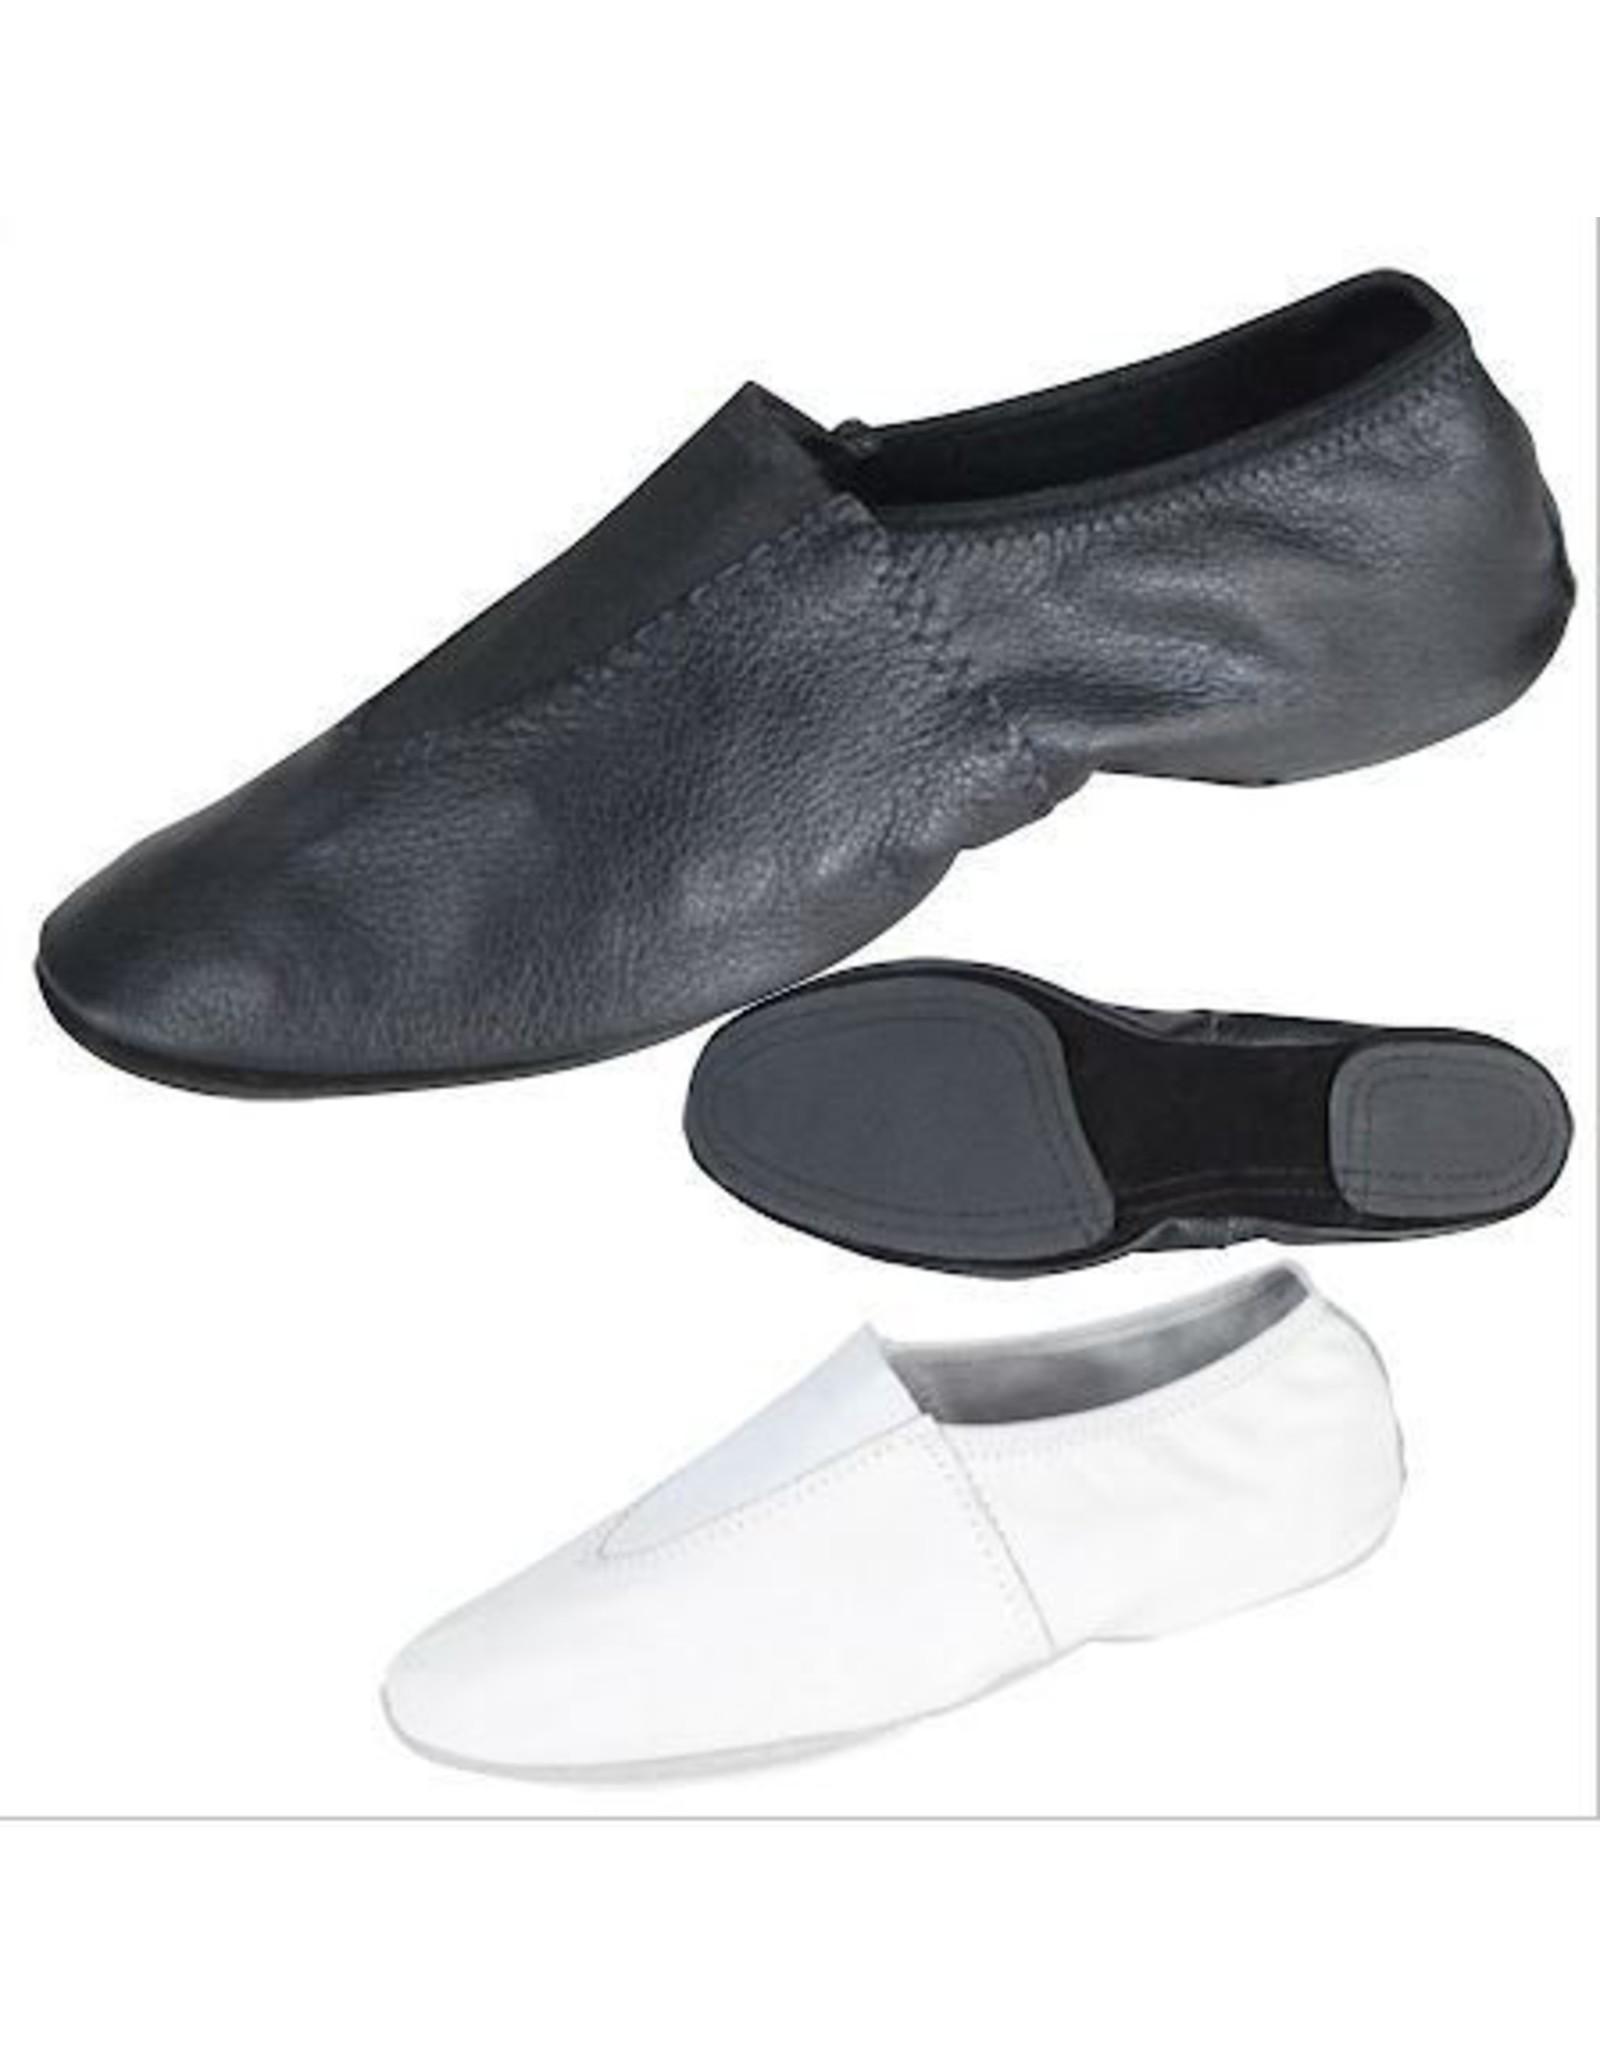 Youth Gymnastic Shoe